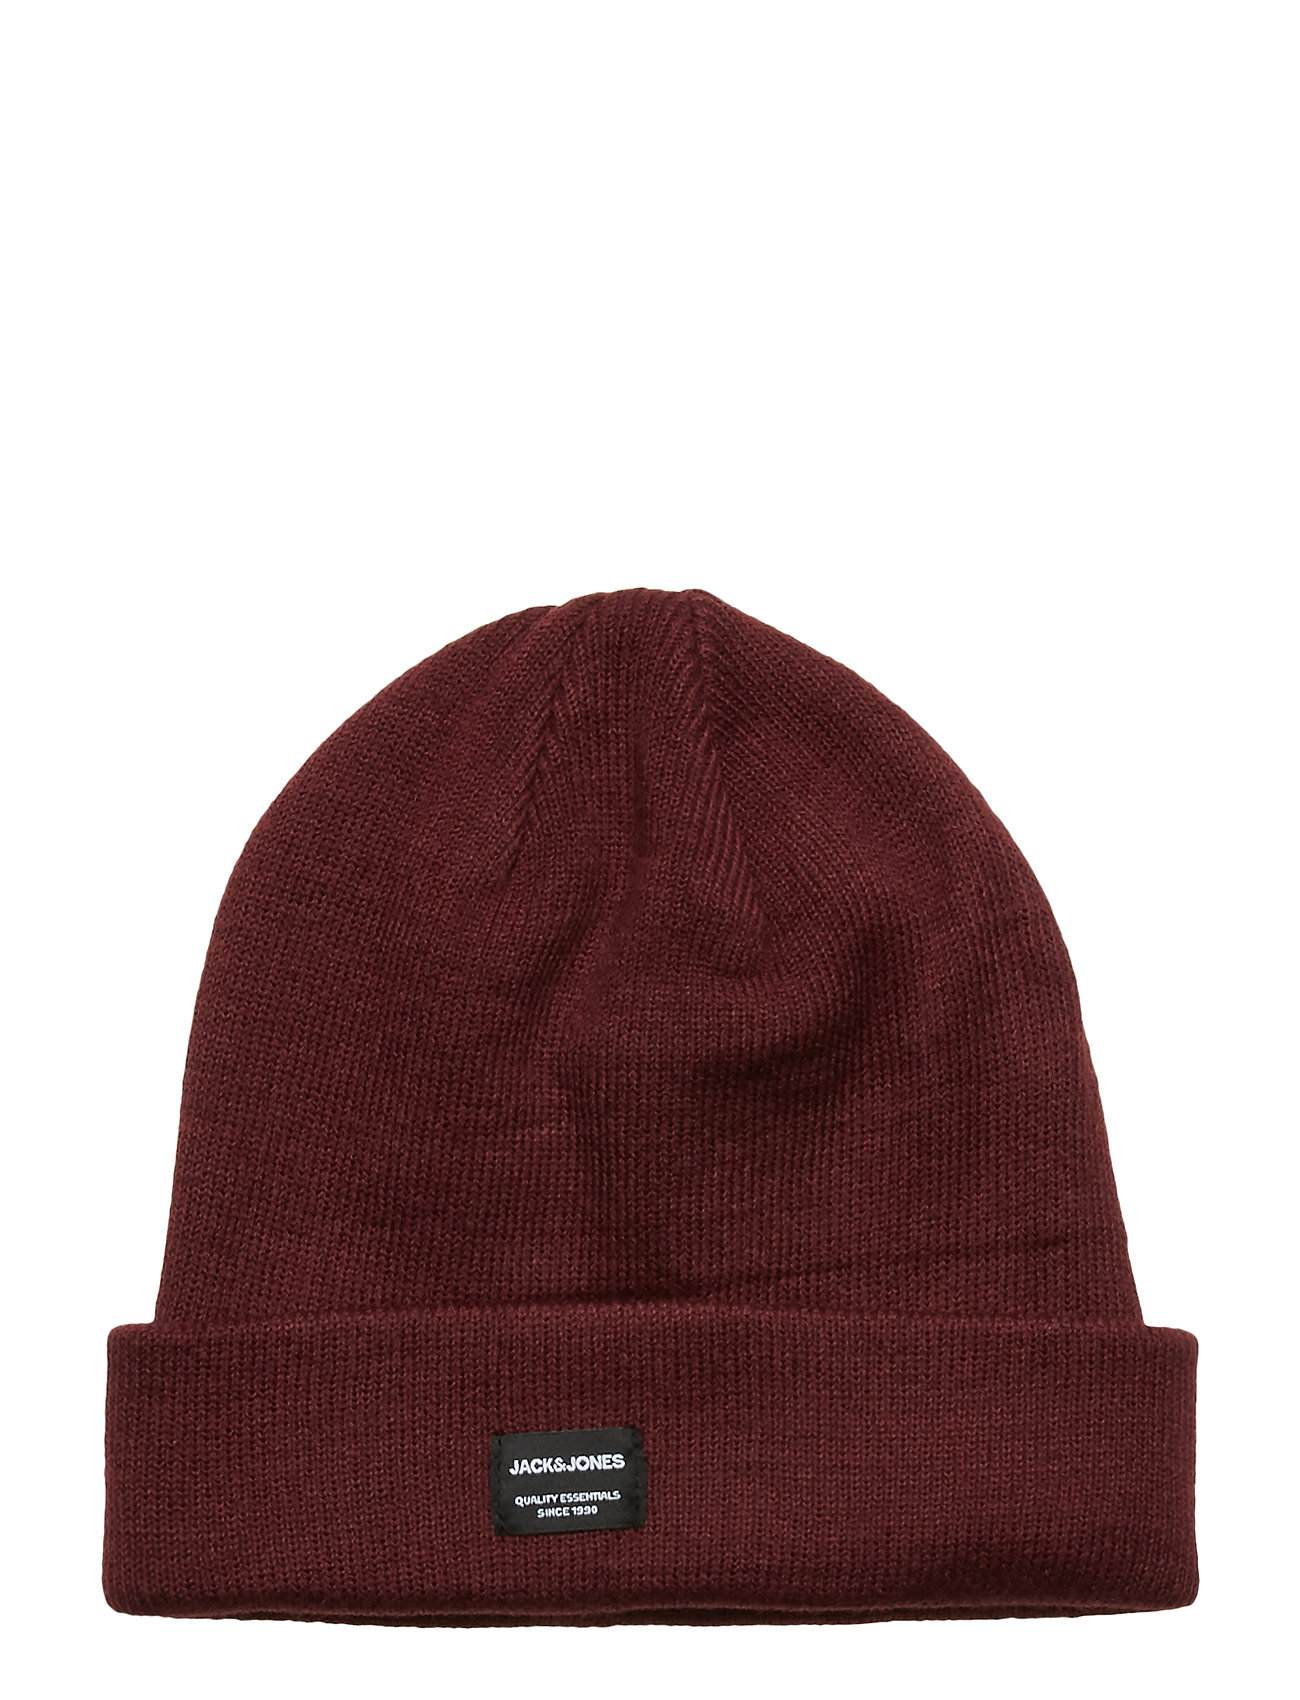 Image of Jacdna Beanie Noos Accessories Hats & Caps Beanies Rød Jack & J S (3213733553)